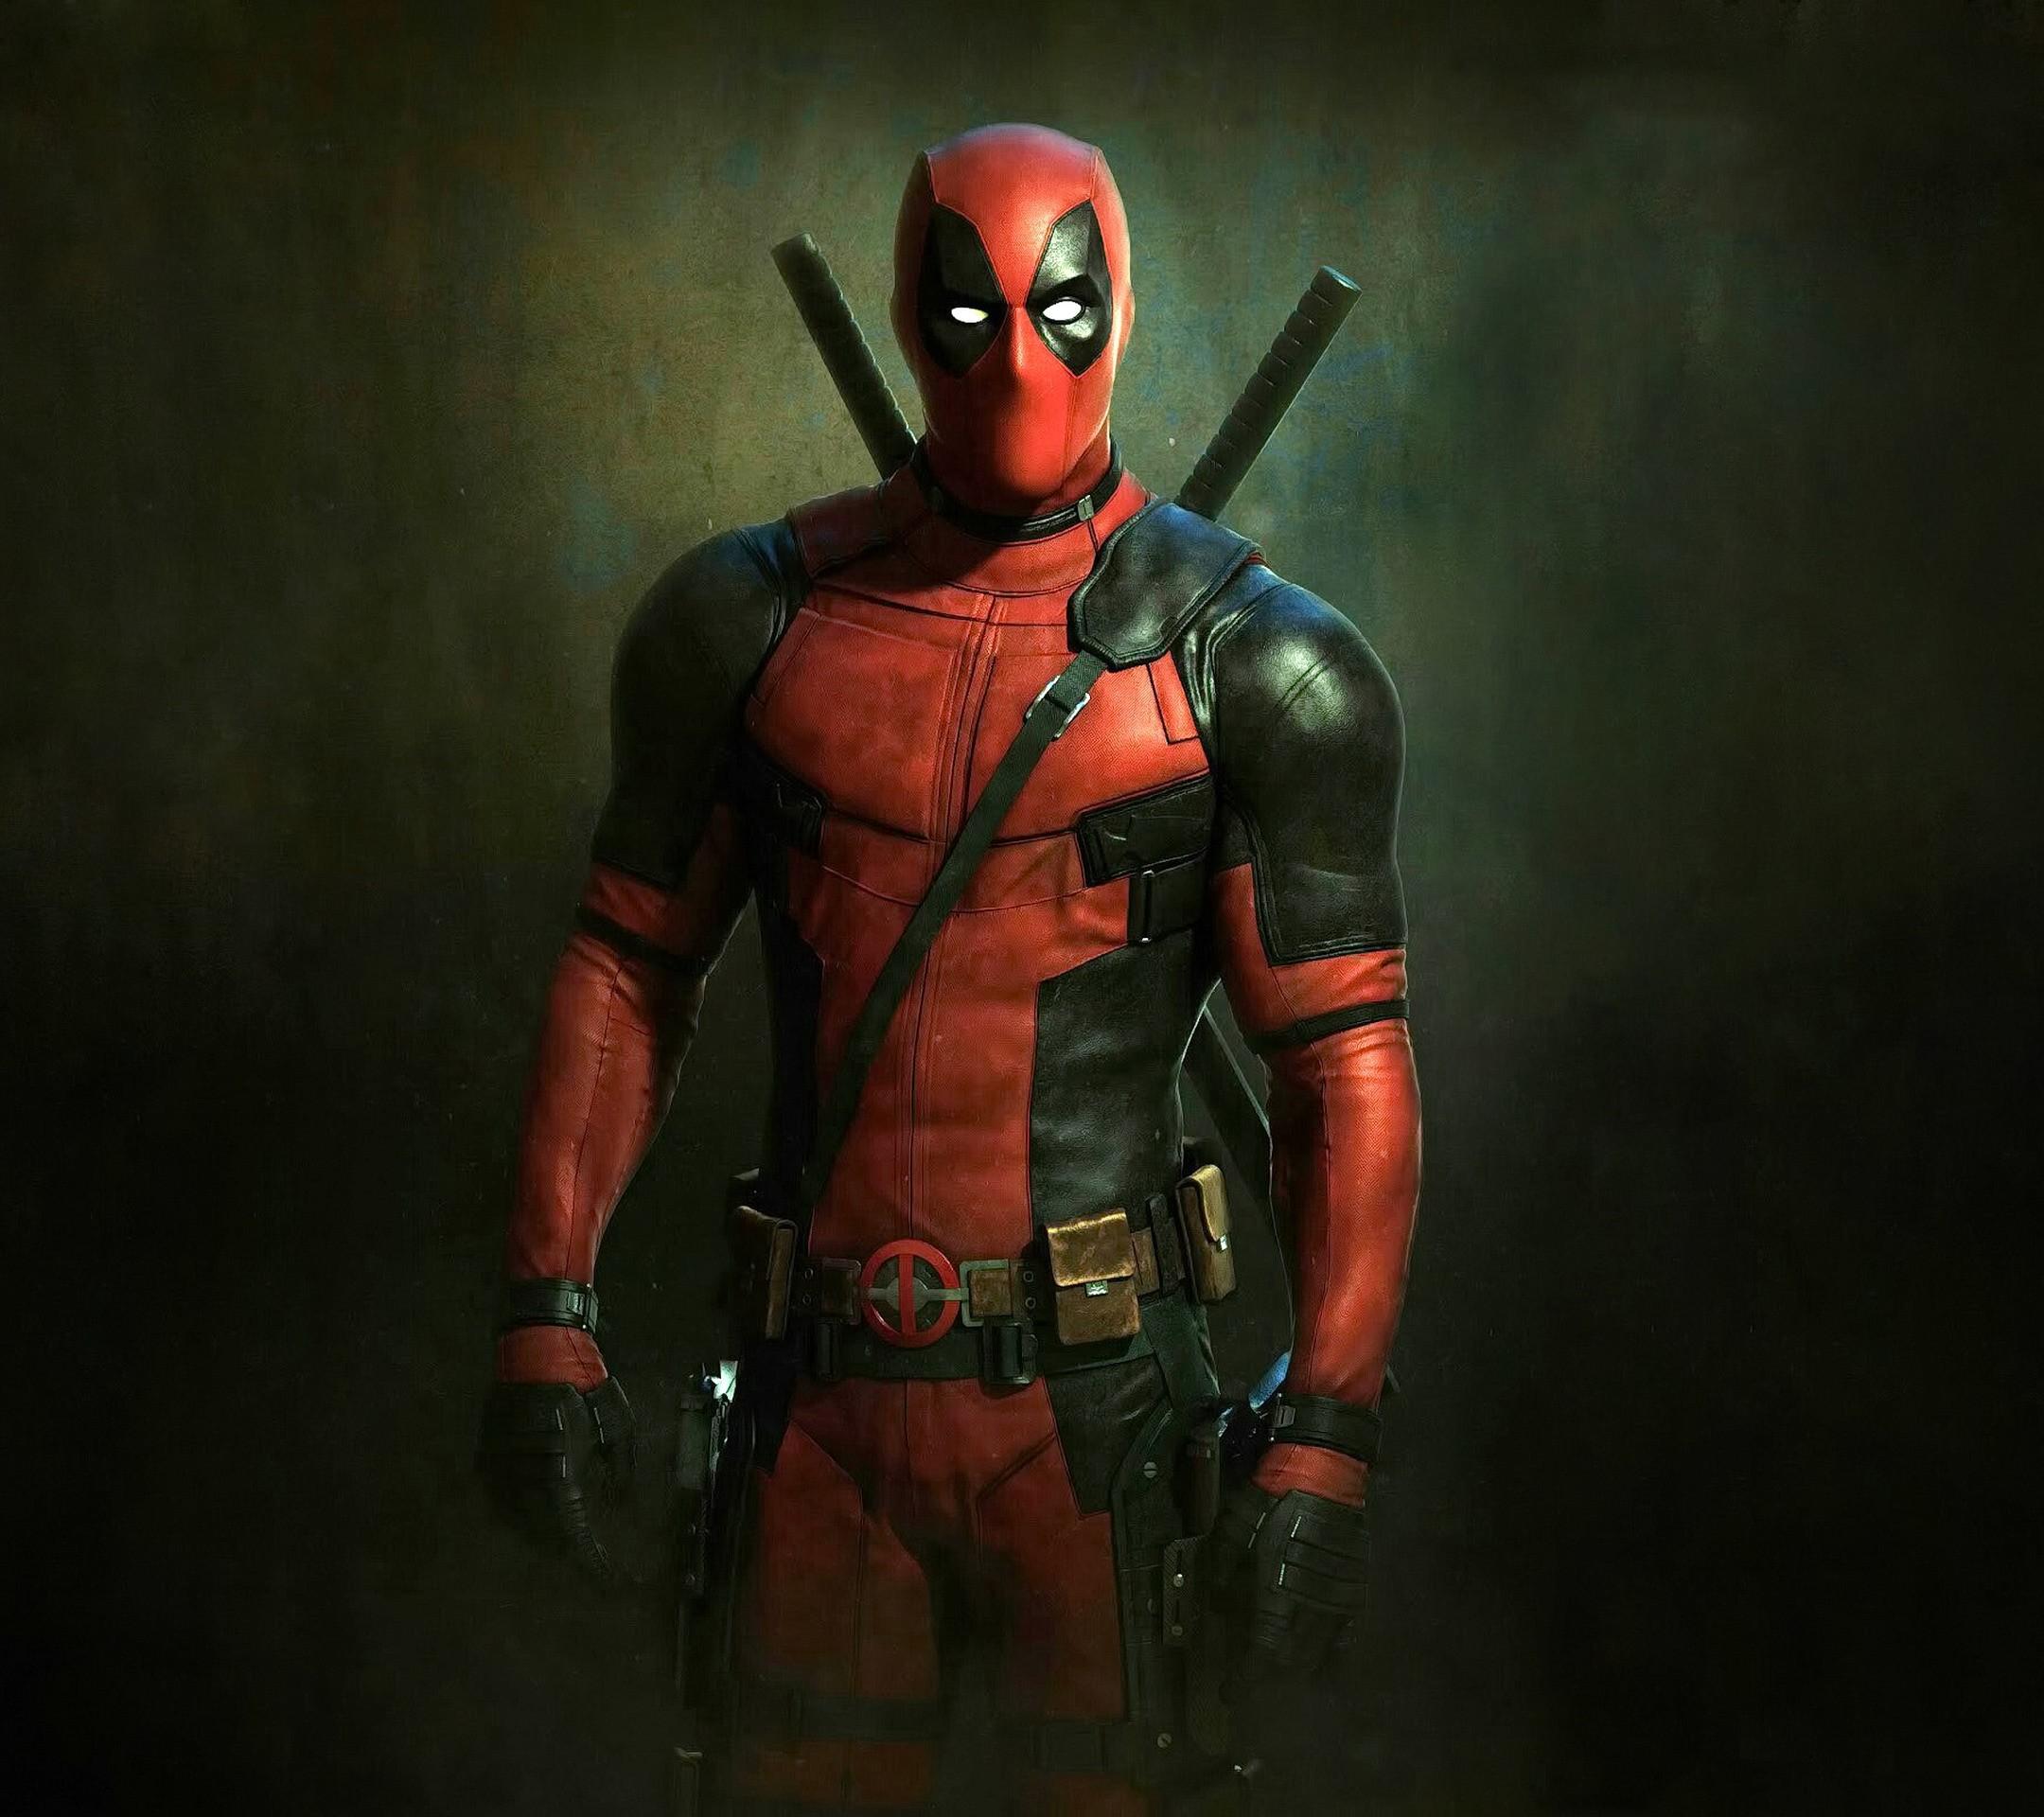 Heros Deadpool Cinema Marvel Comics Fond Ecran Hd